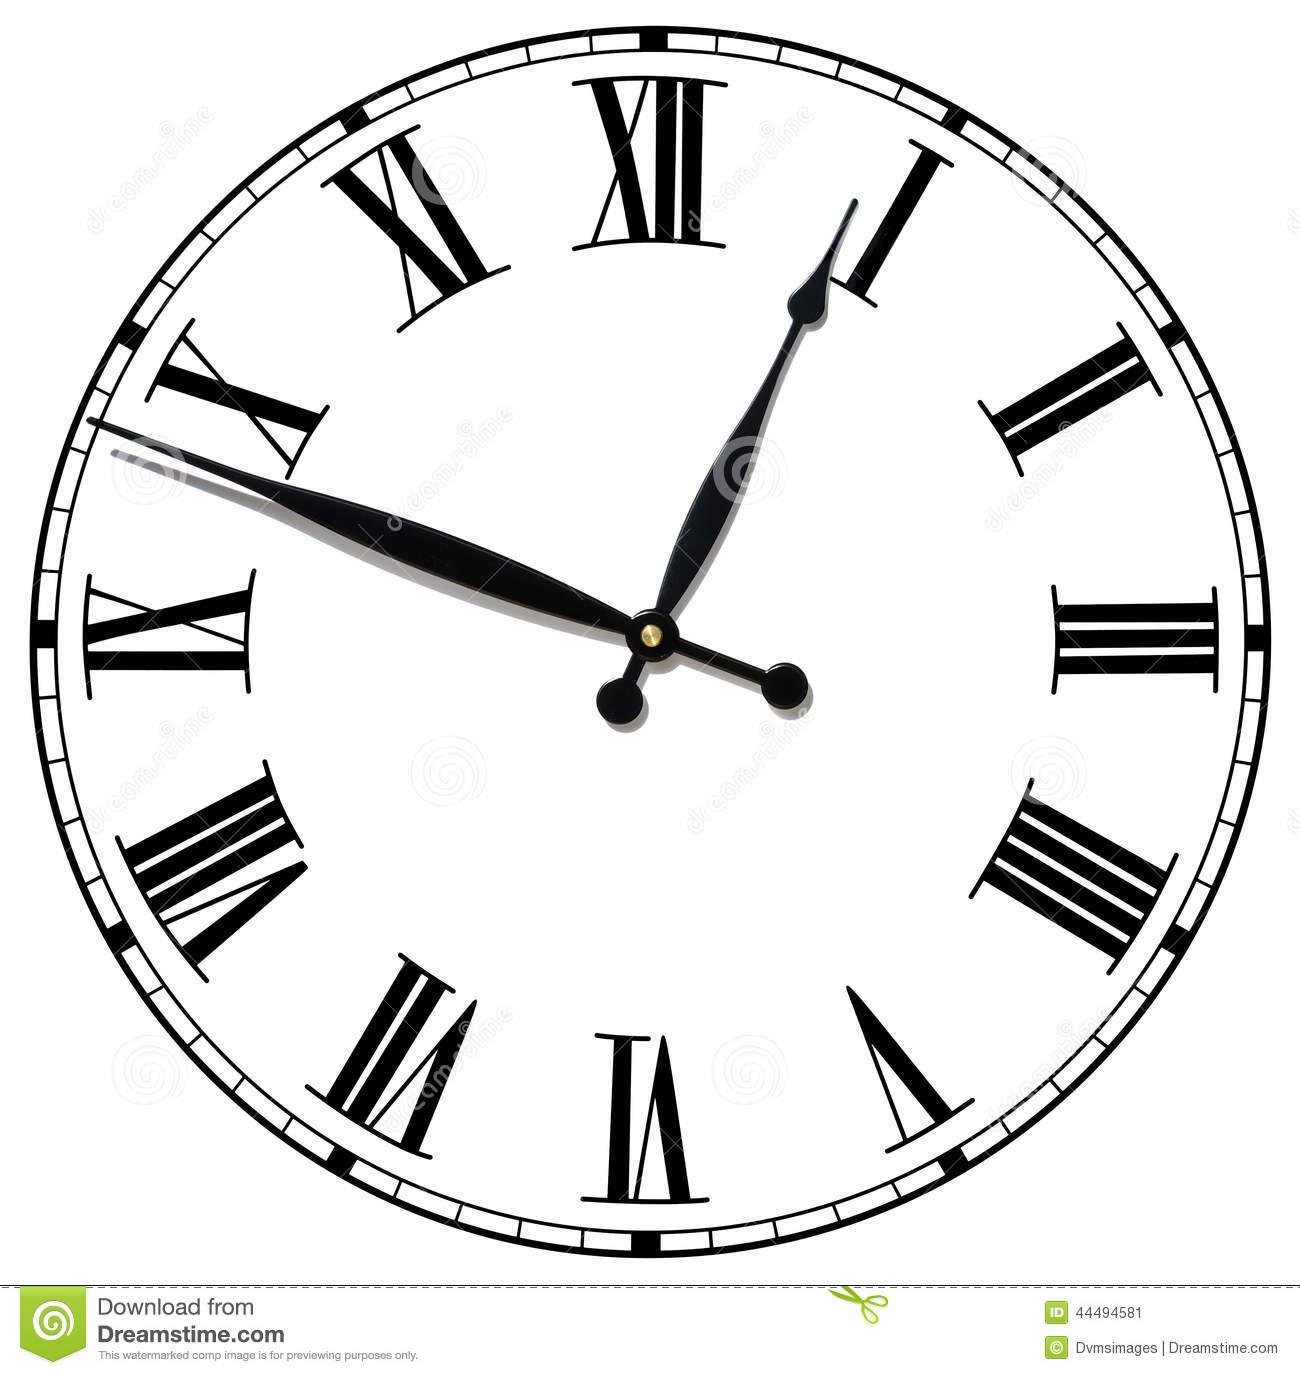 Roman Numeral Clock Face Vector At Vectorified